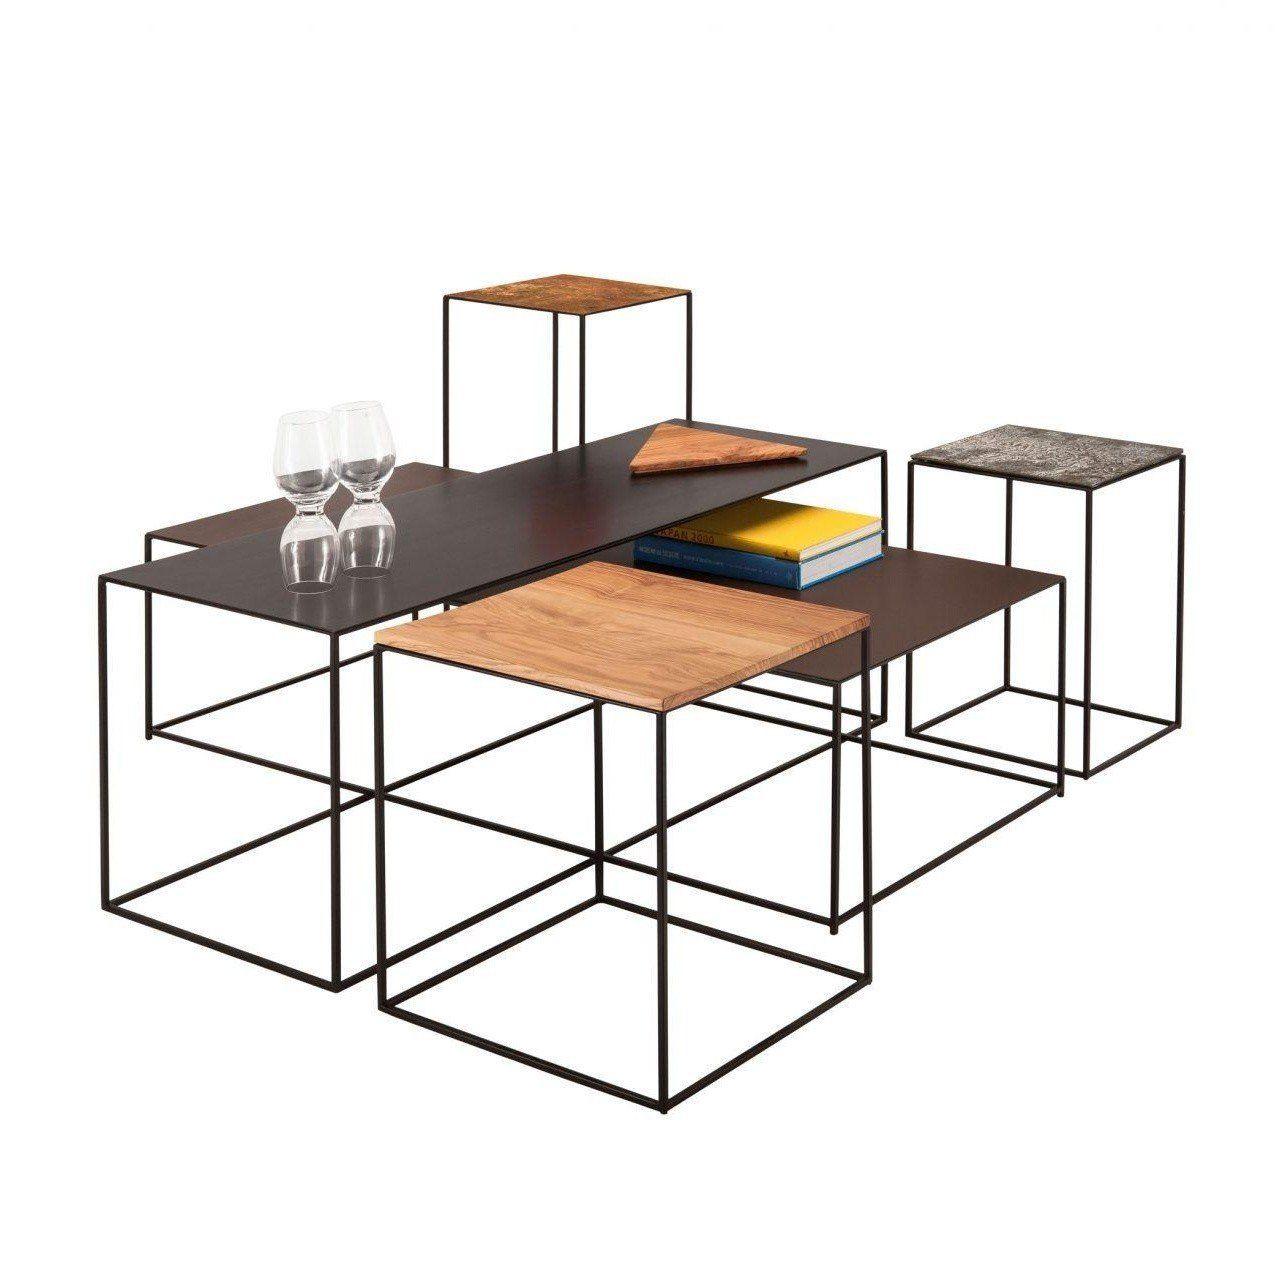 slim irony art side table 41x41x64cm zeus. Black Bedroom Furniture Sets. Home Design Ideas